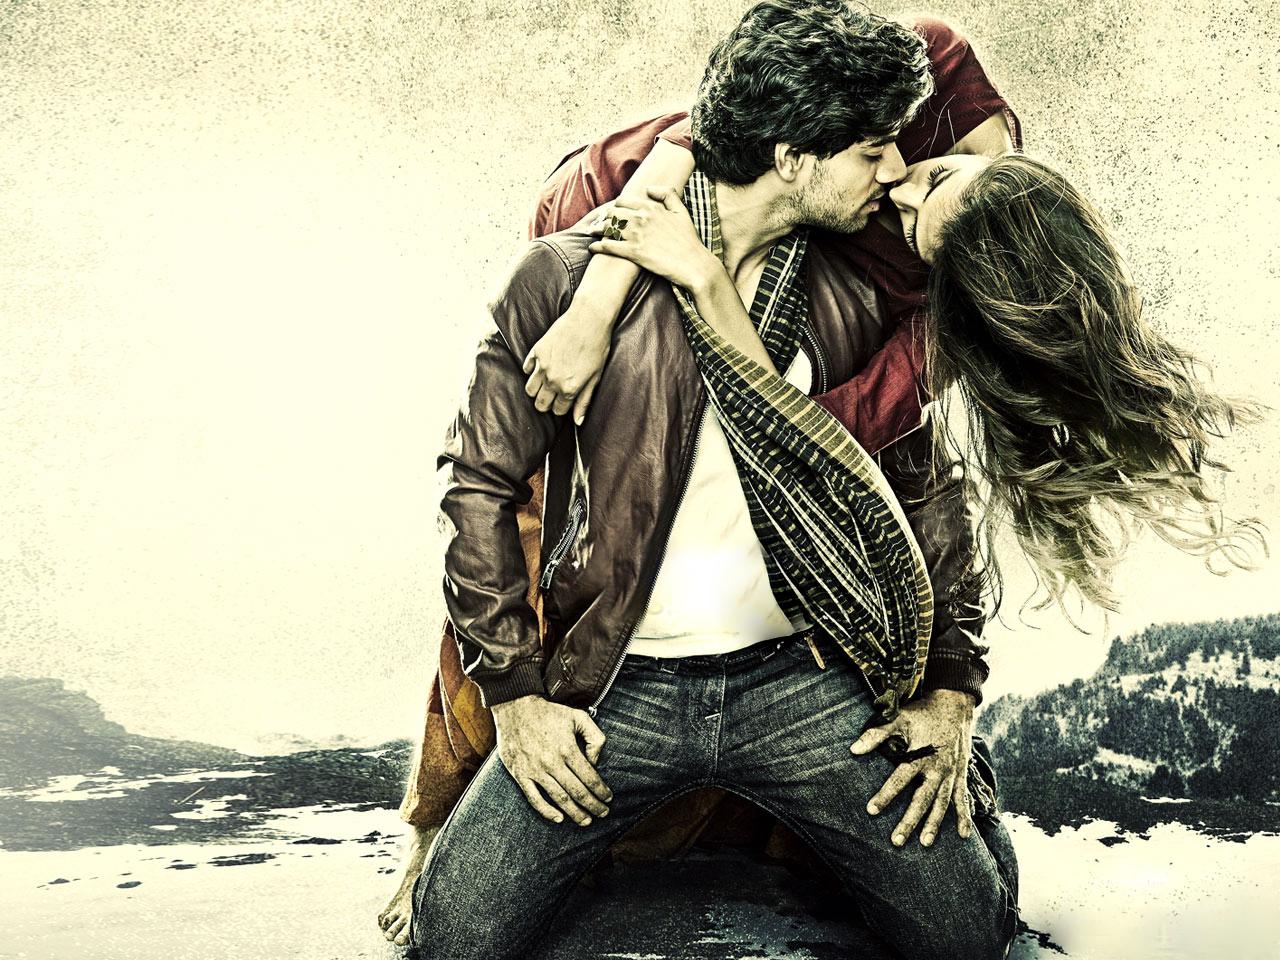 bollywood new movie hero latest hd wallpapers cinema takies